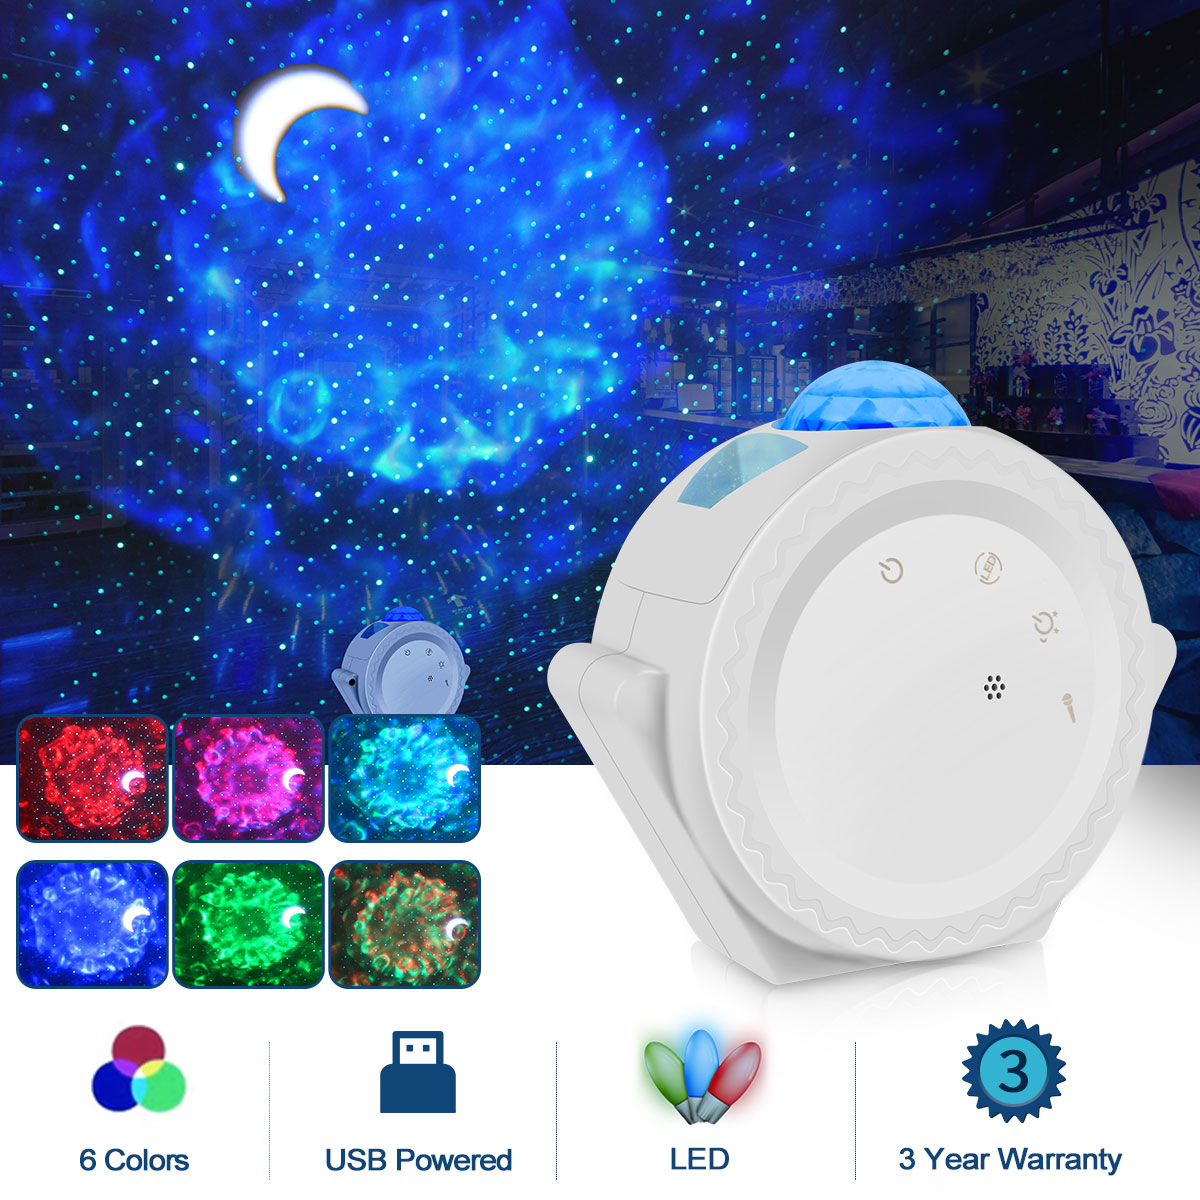 LED Starry Sky Projector Light 360 Degree Rotation Nebula Cloud Night Light 6 Colors Ocean Waving Light Christmas Gift Navidad #